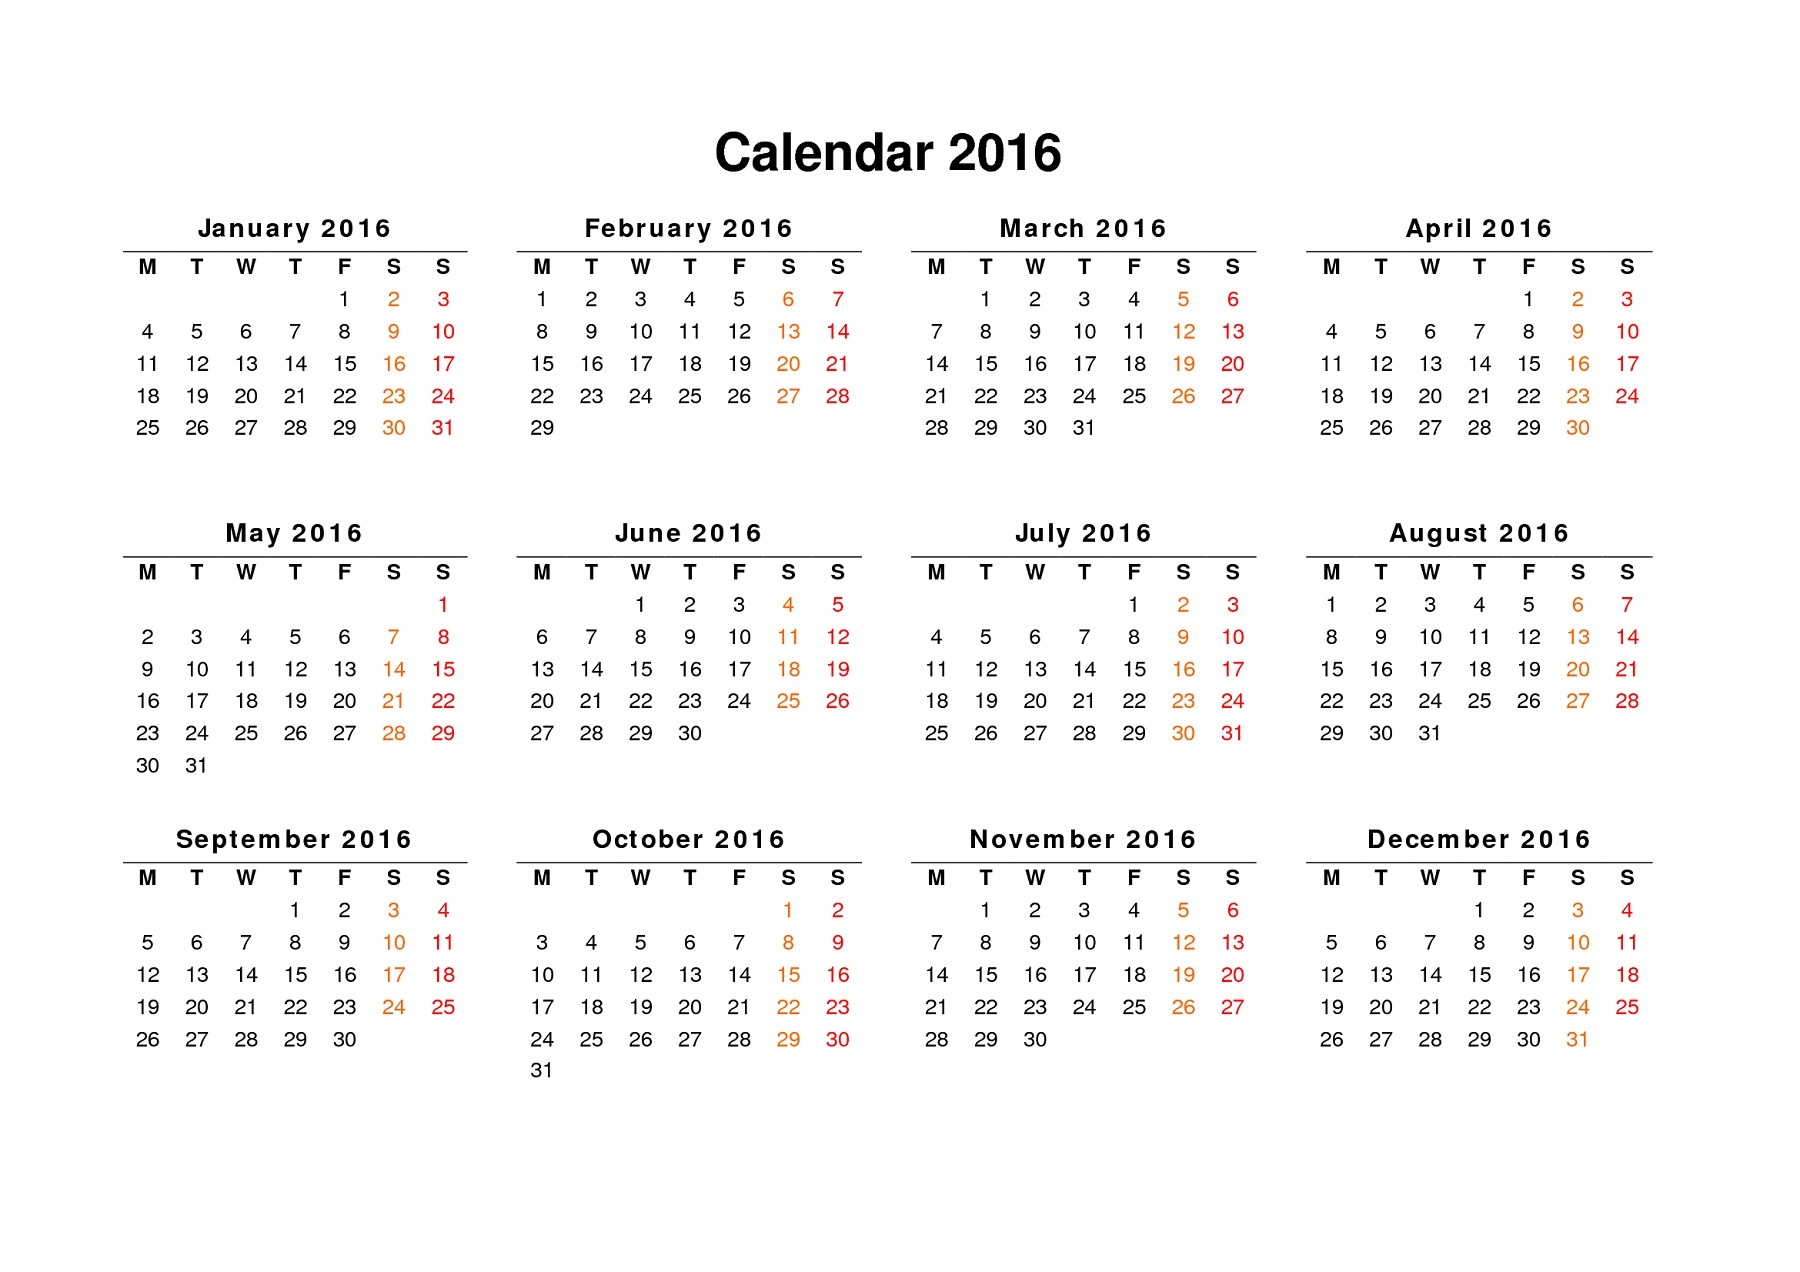 Calendar 2016 To Print